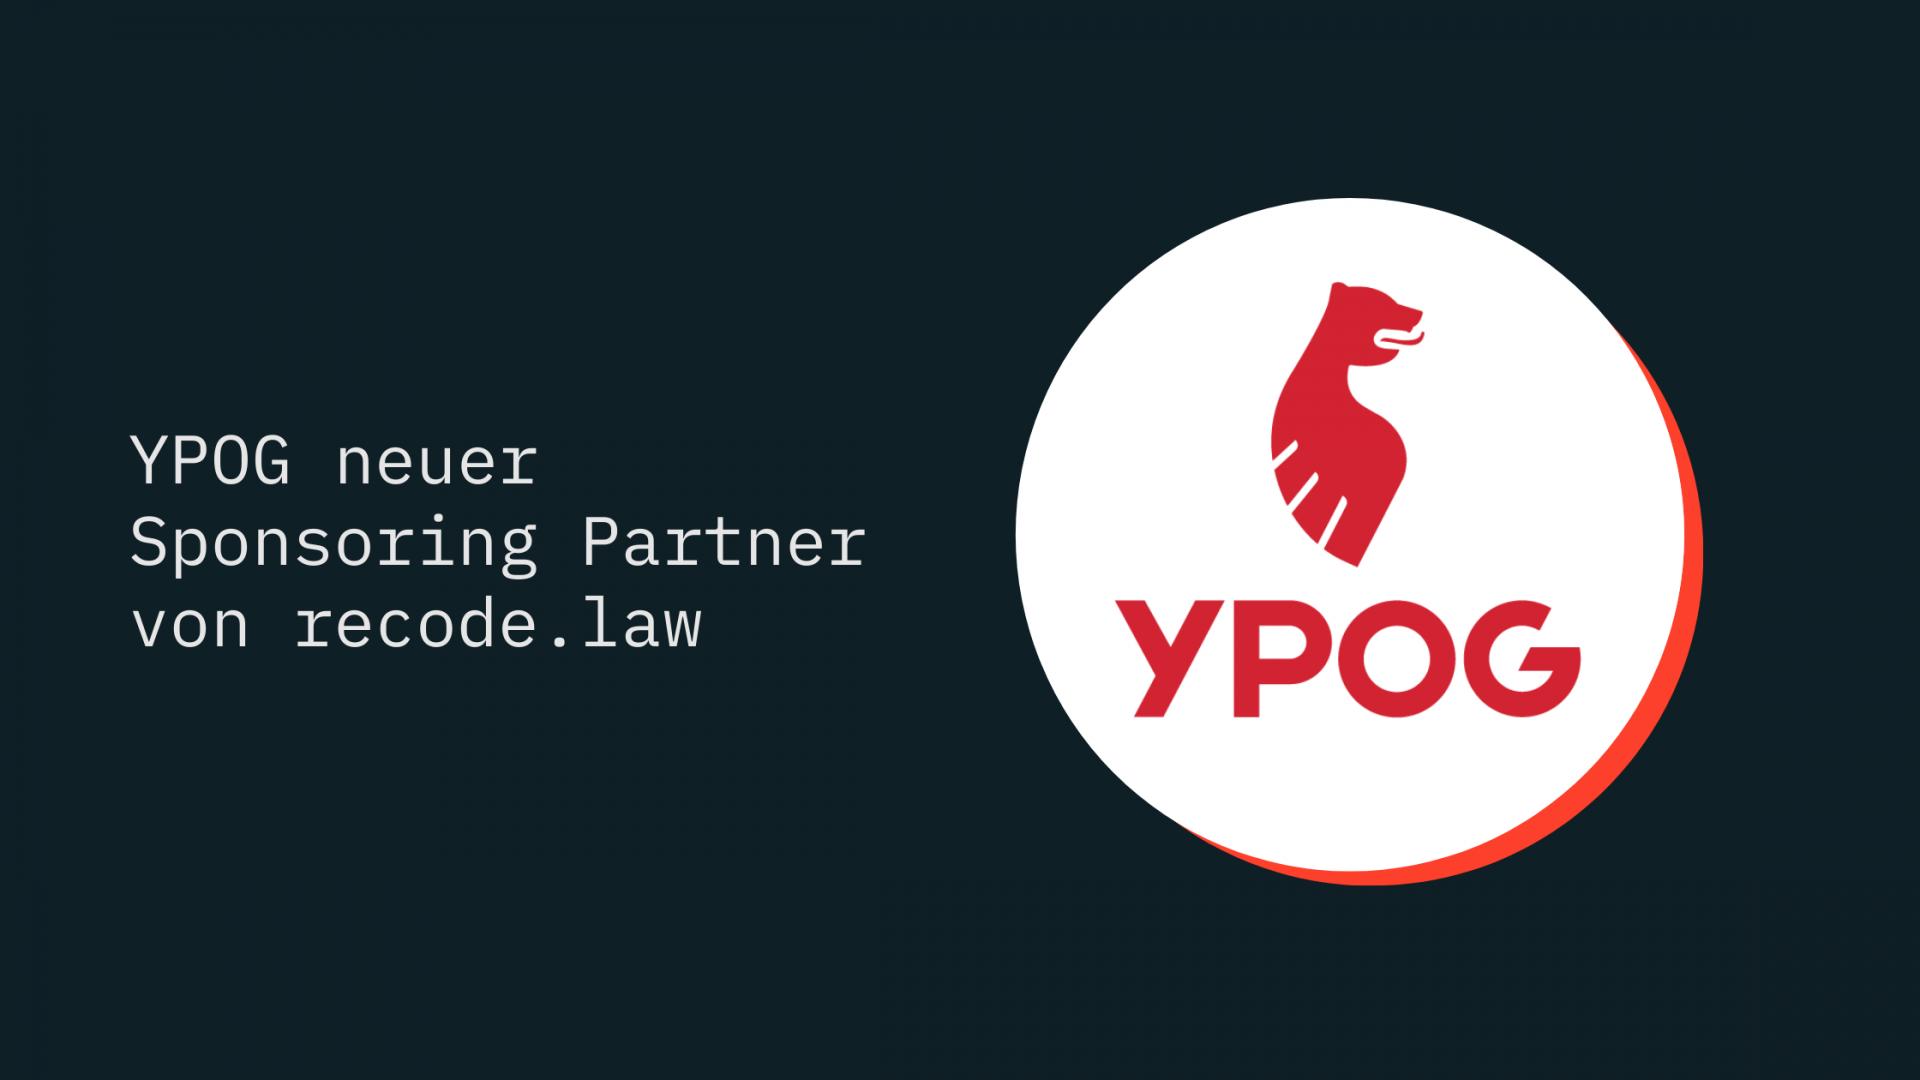 ypog-recode-law-partner-2021